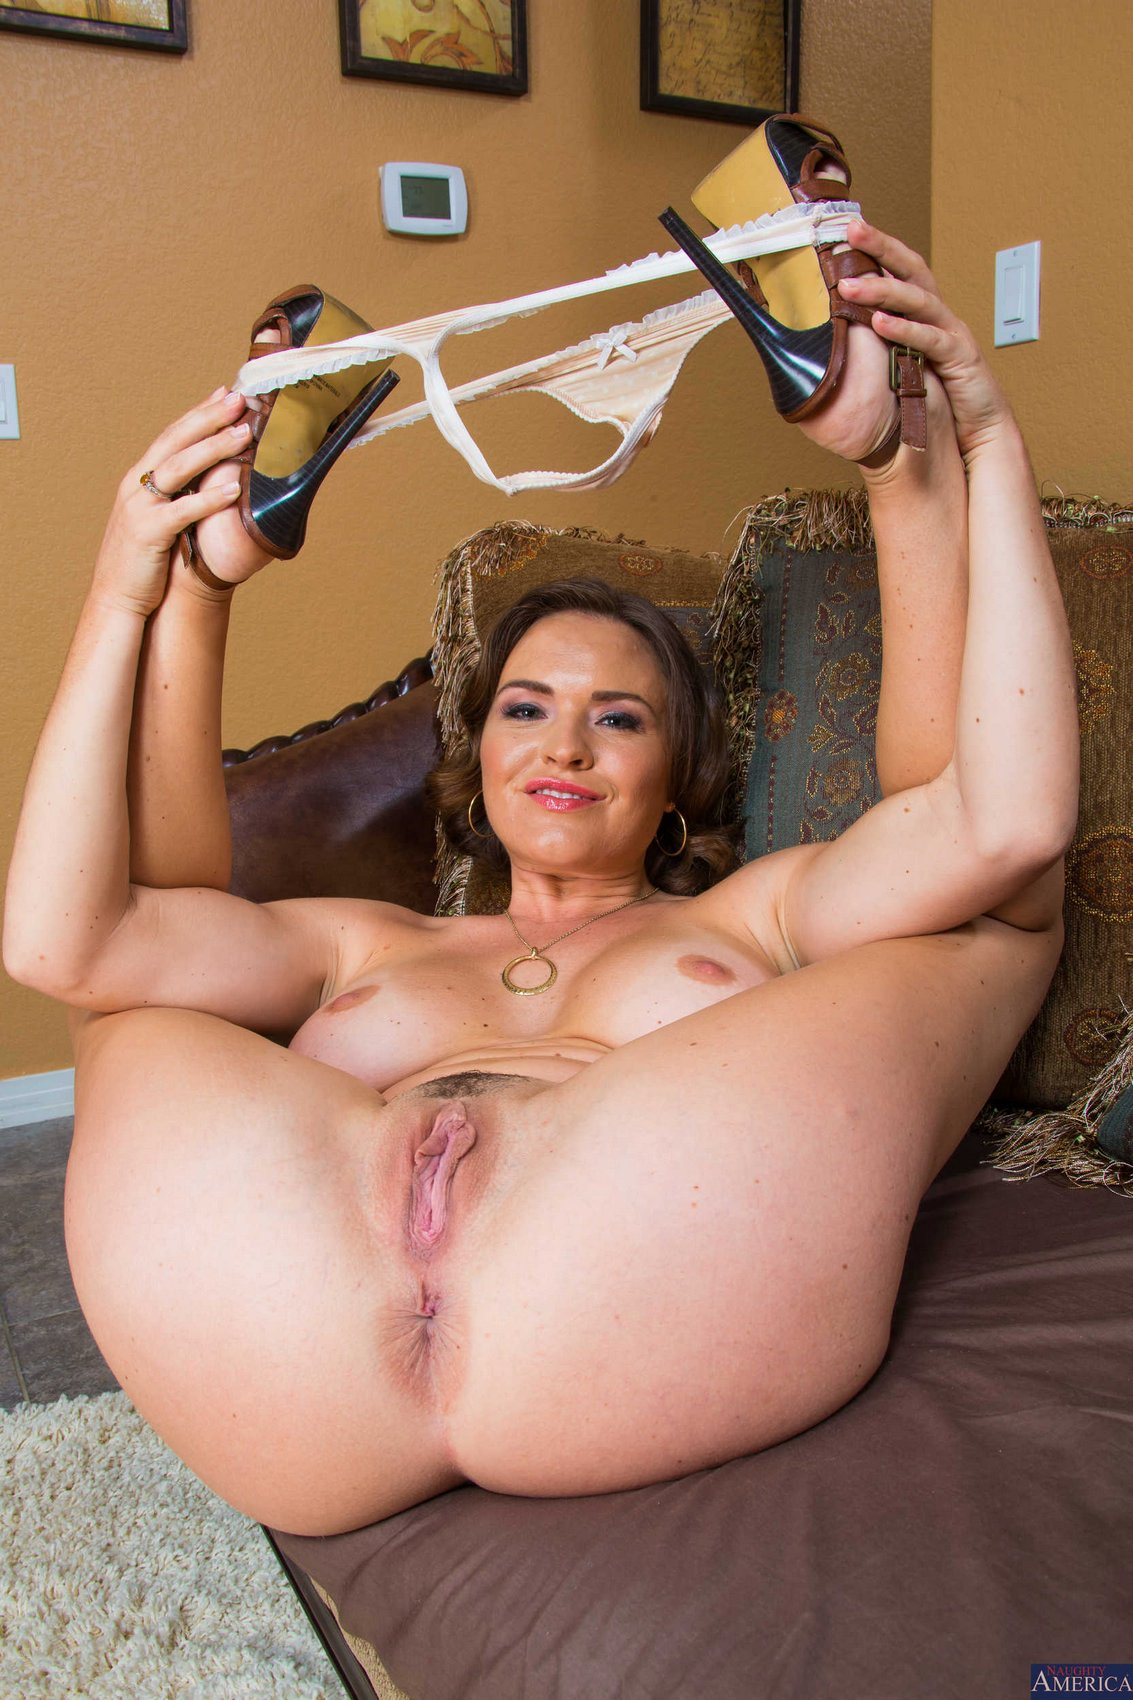 Very pendulous breast